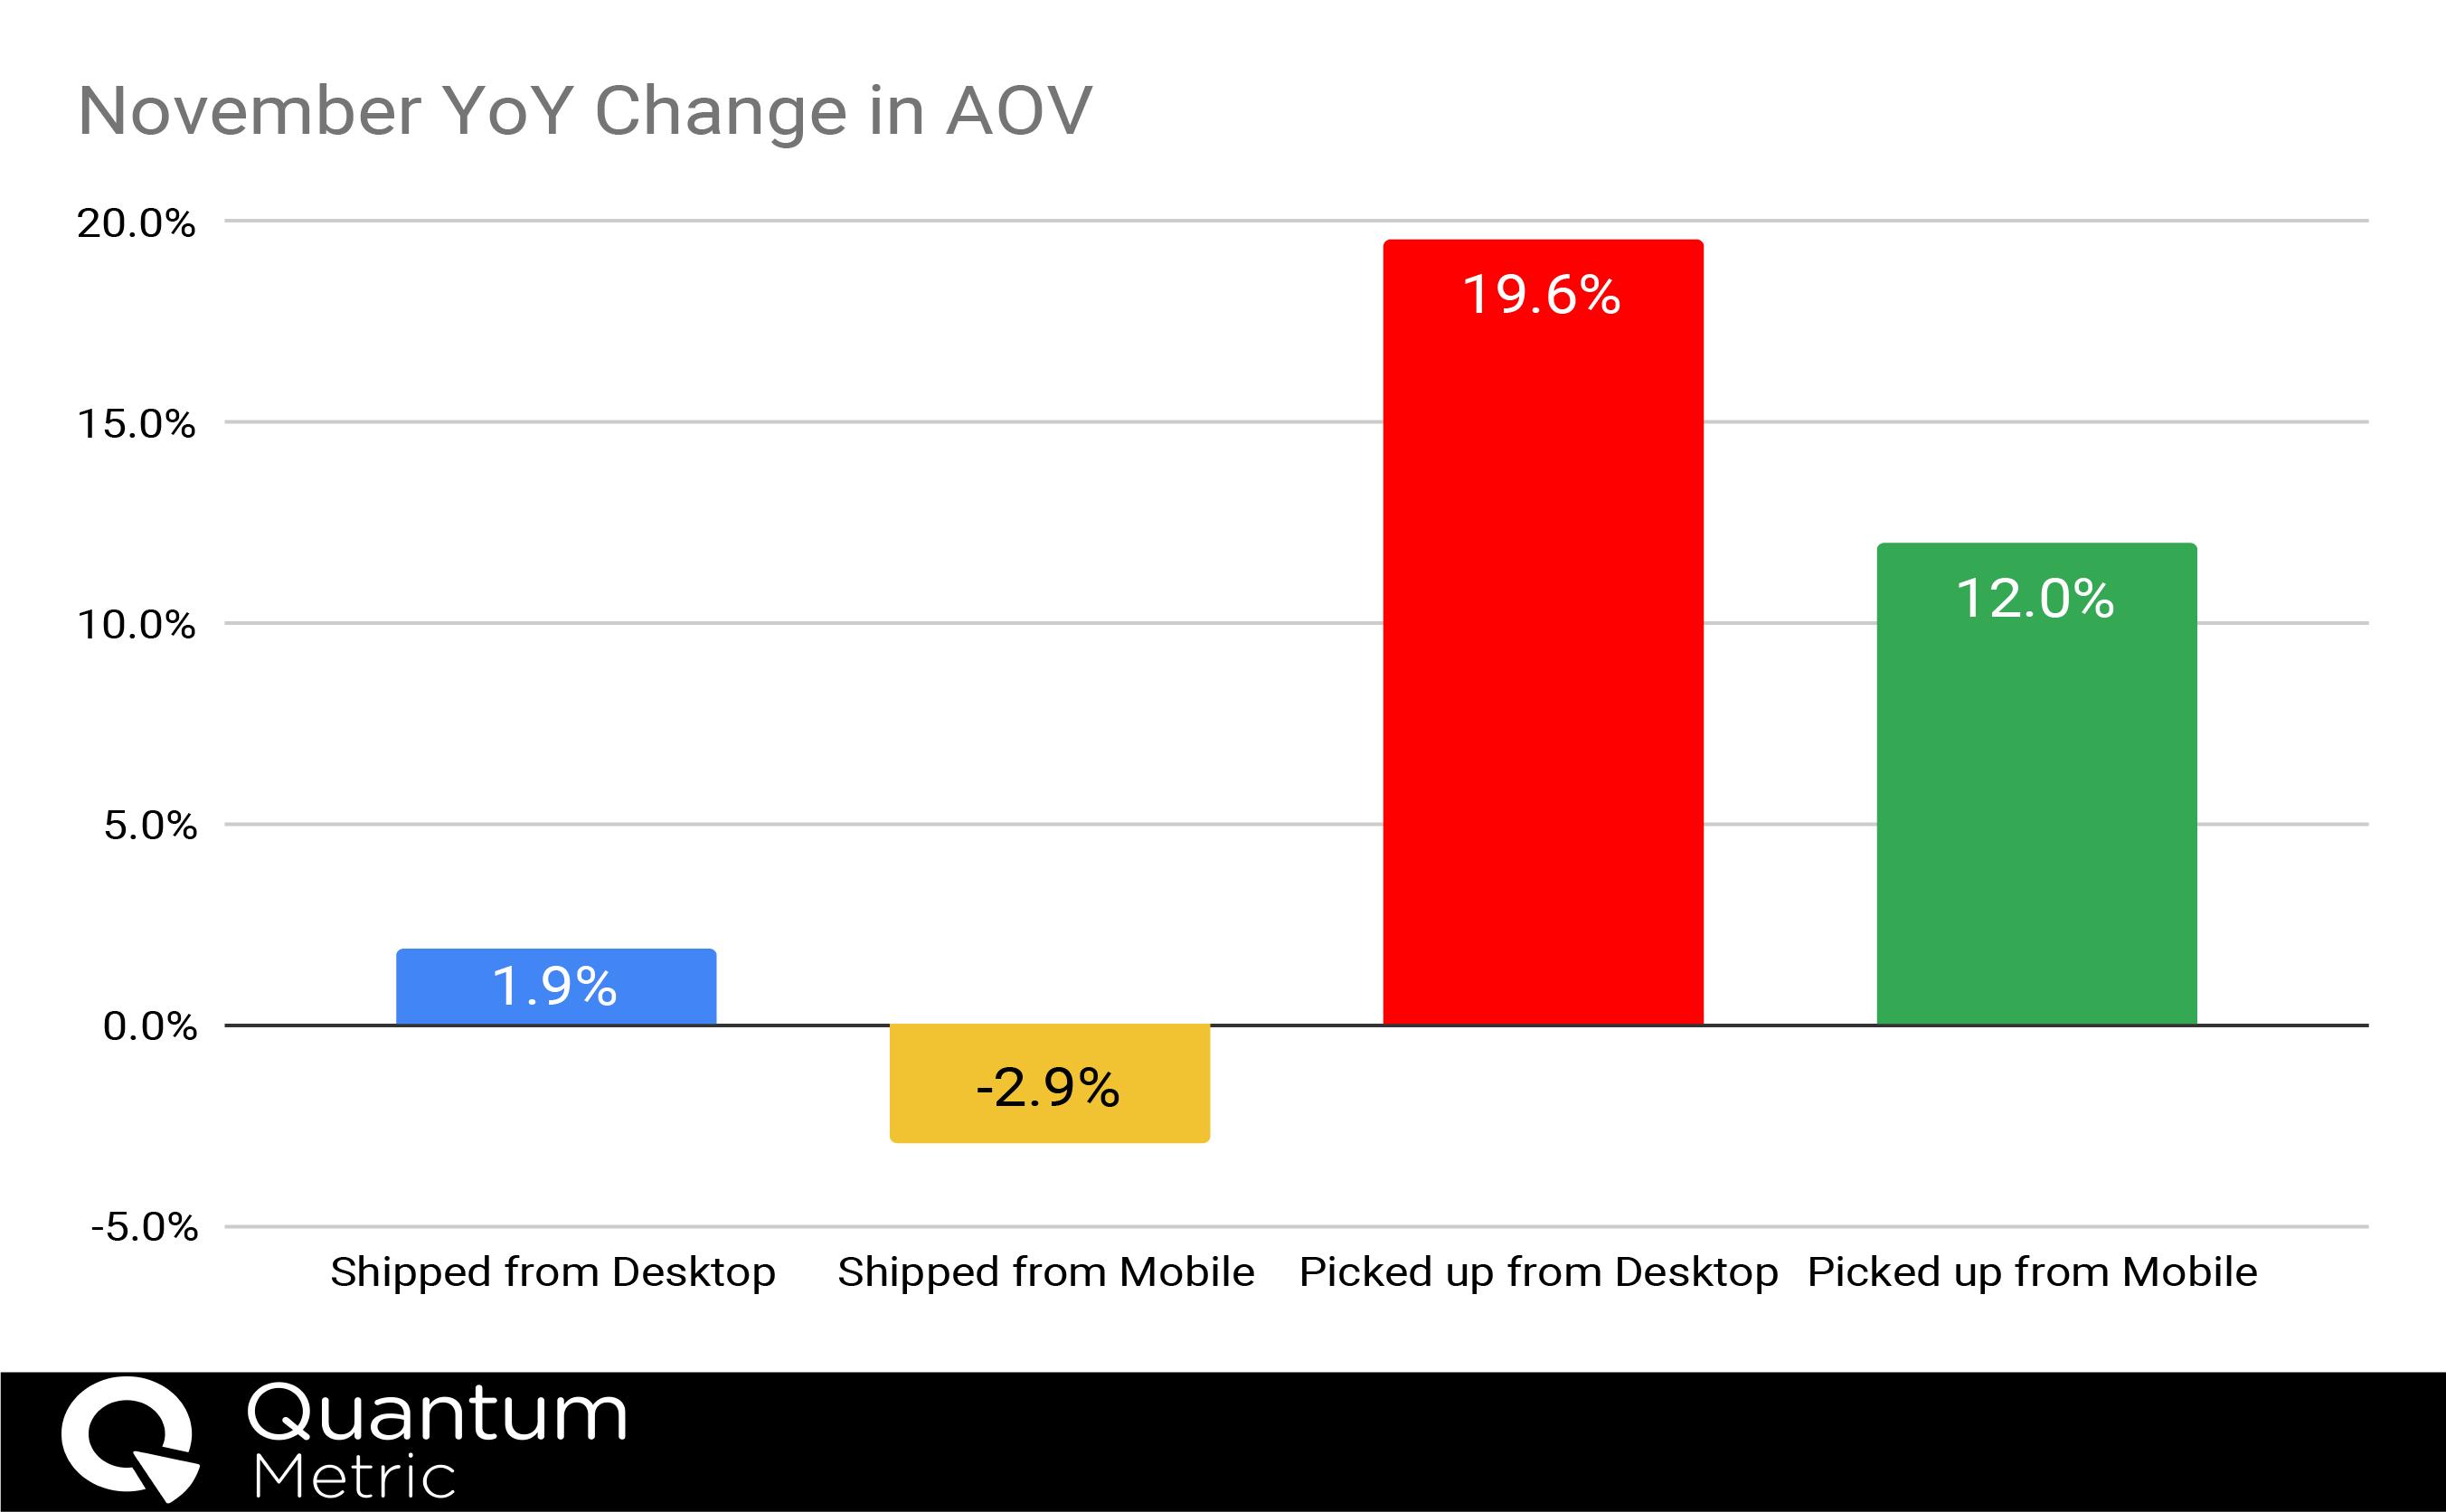 Nov YoY Changes Graphic